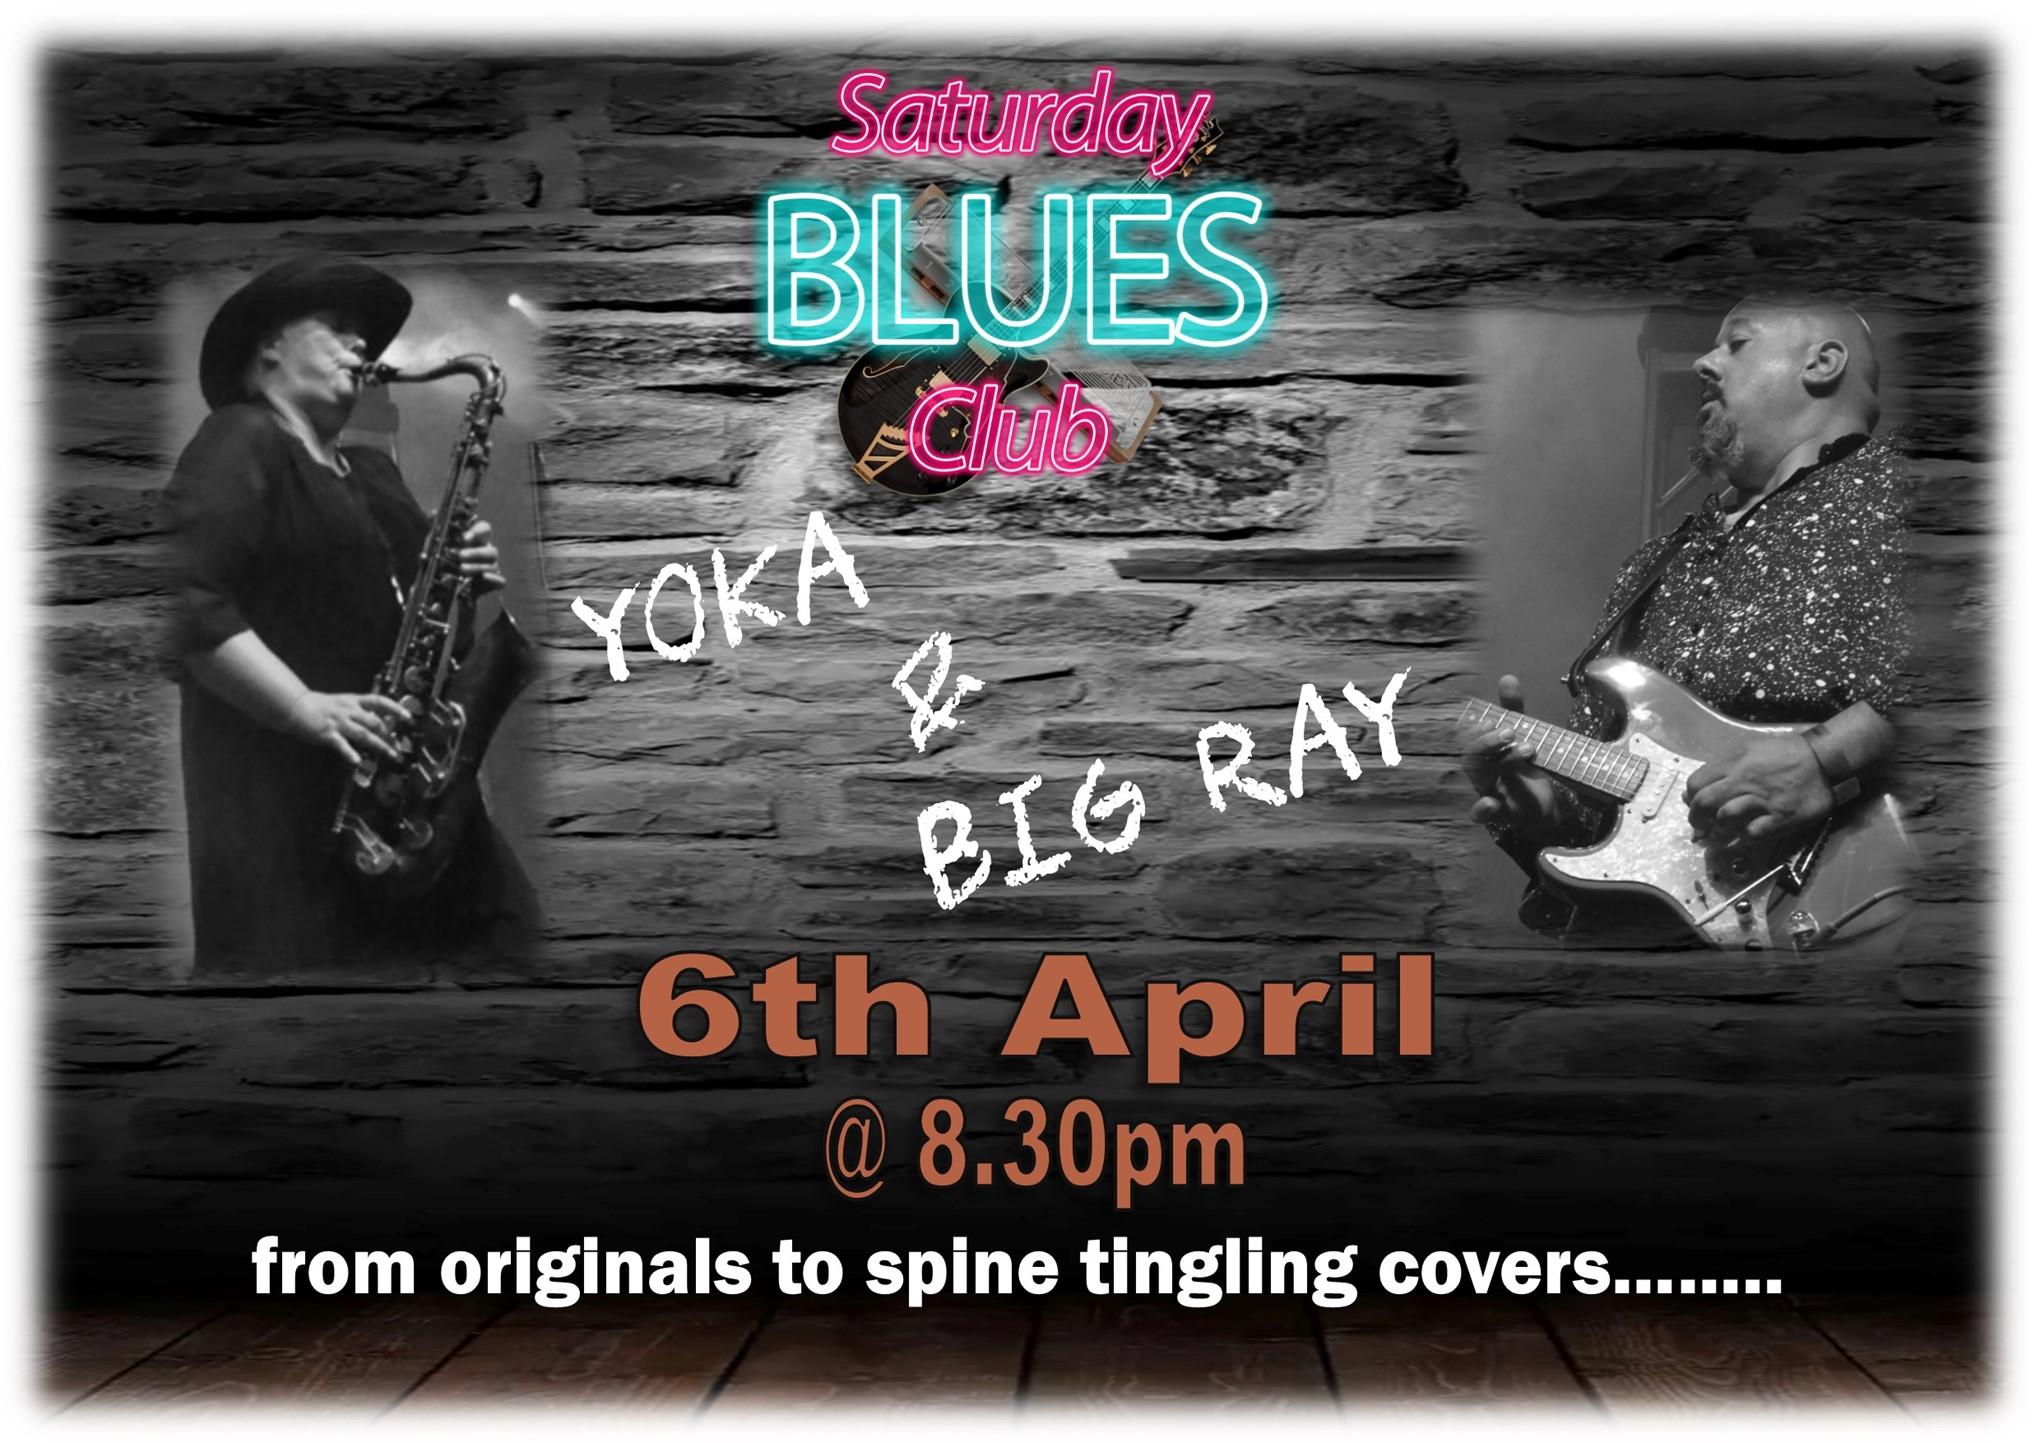 Saturday Blues Club with Yoka & Big Ray